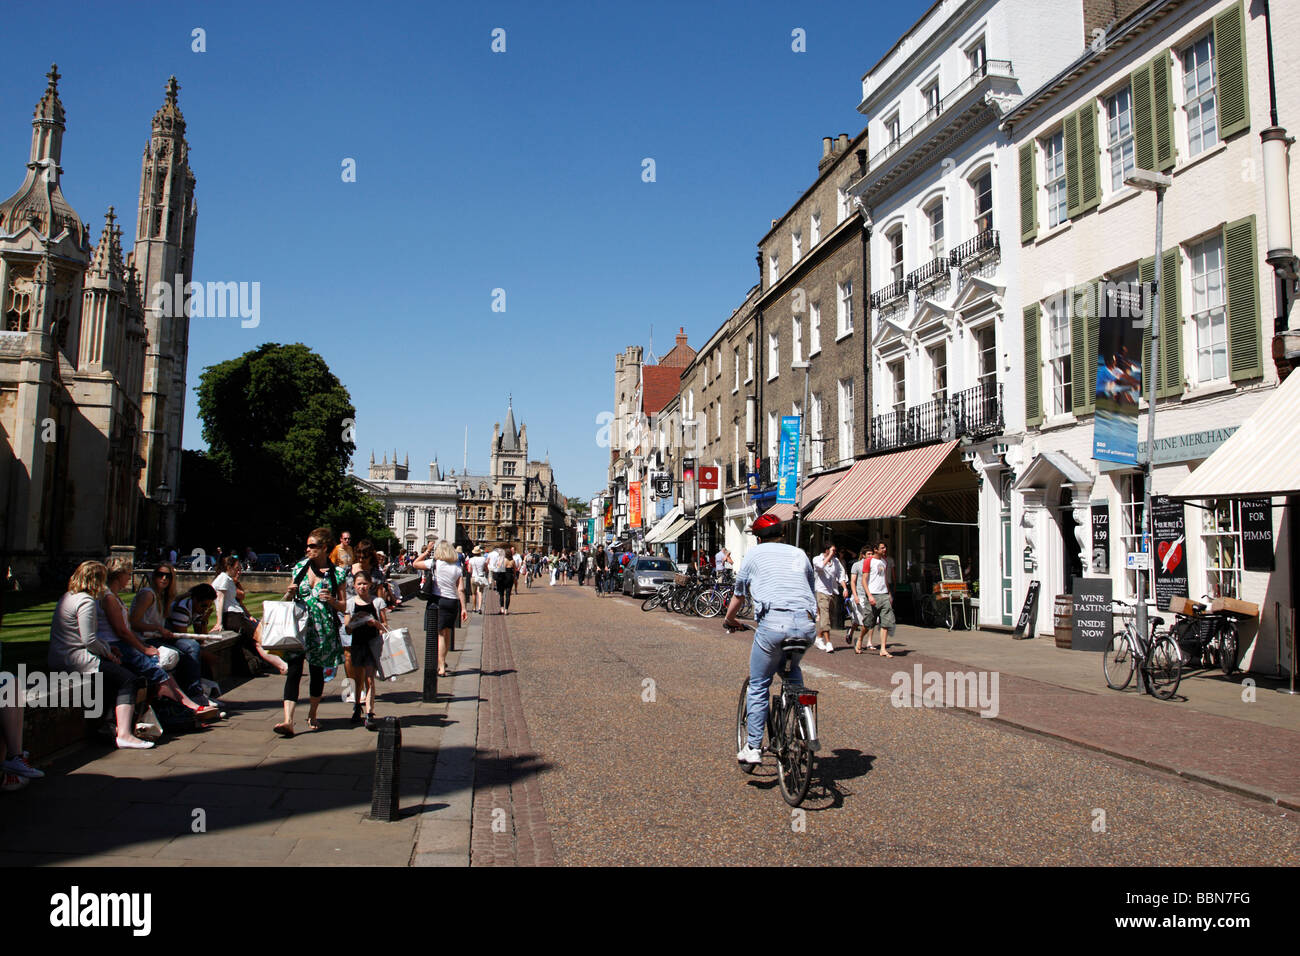 street view of kings parade cambridge uk - Stock Image